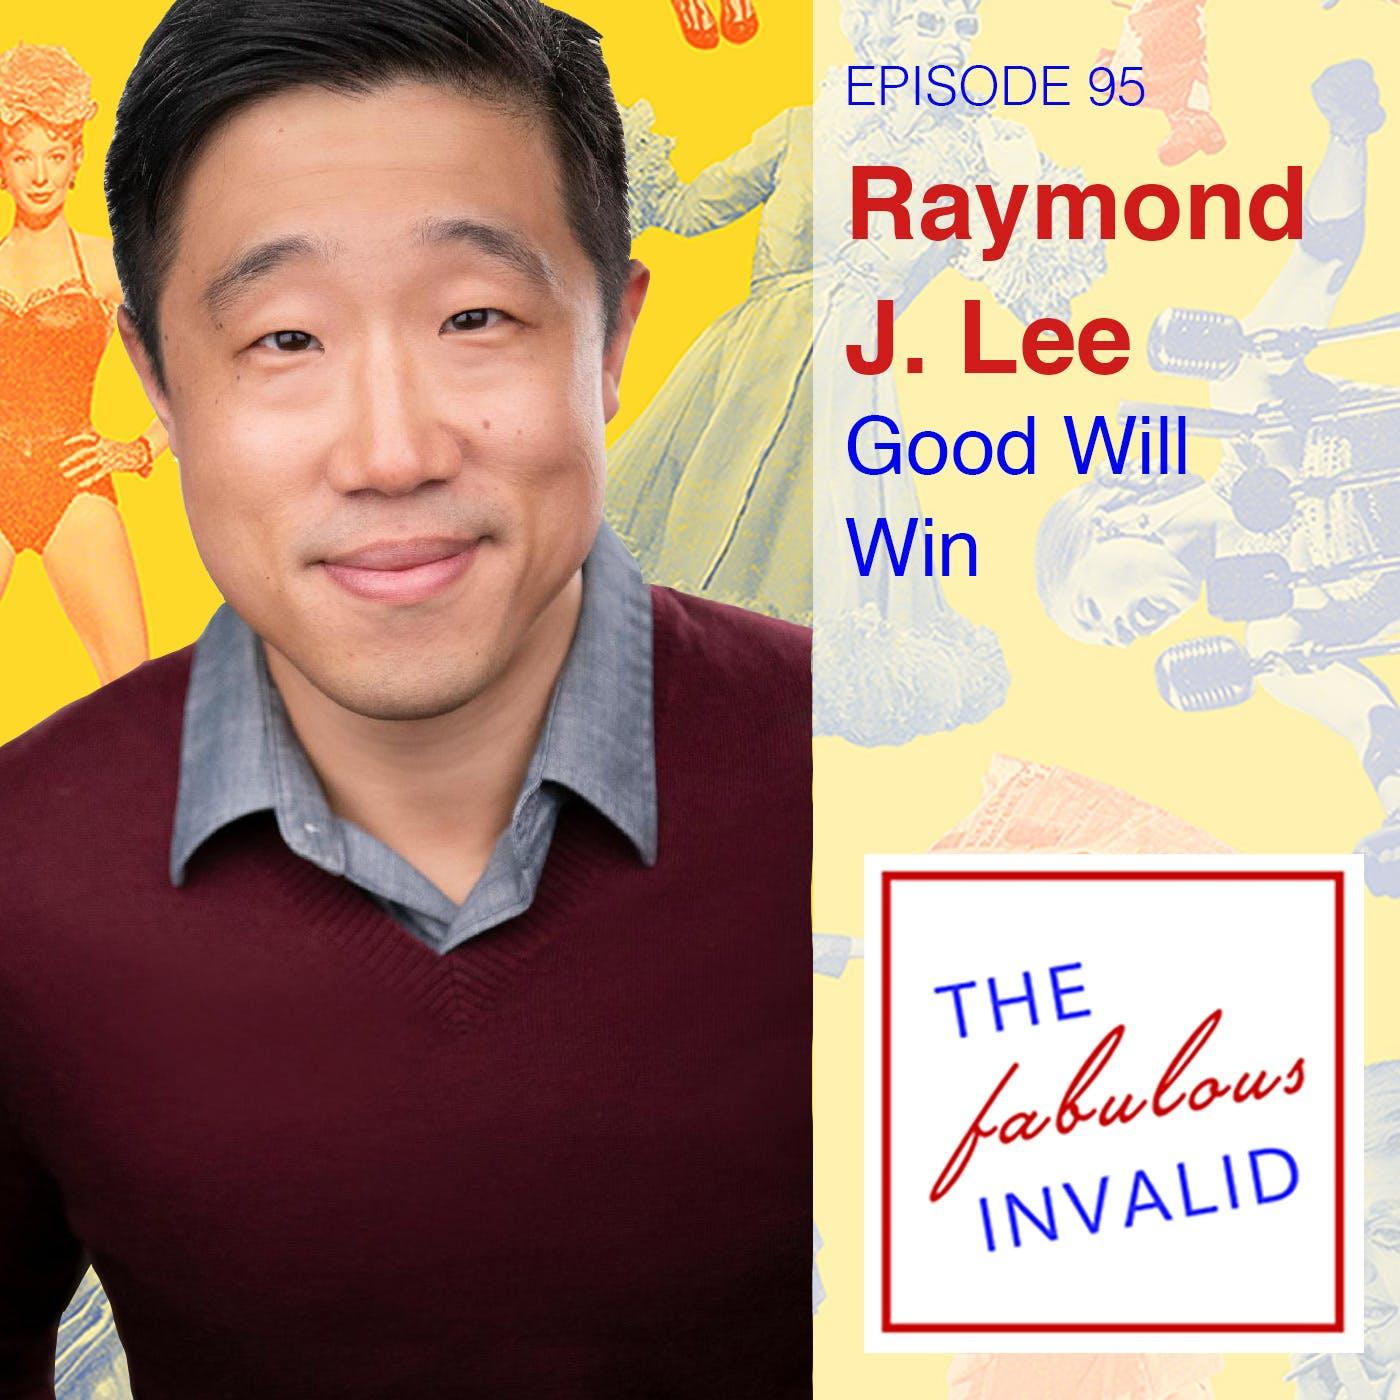 Episode 95: Raymond J. Lee: Good Will Win